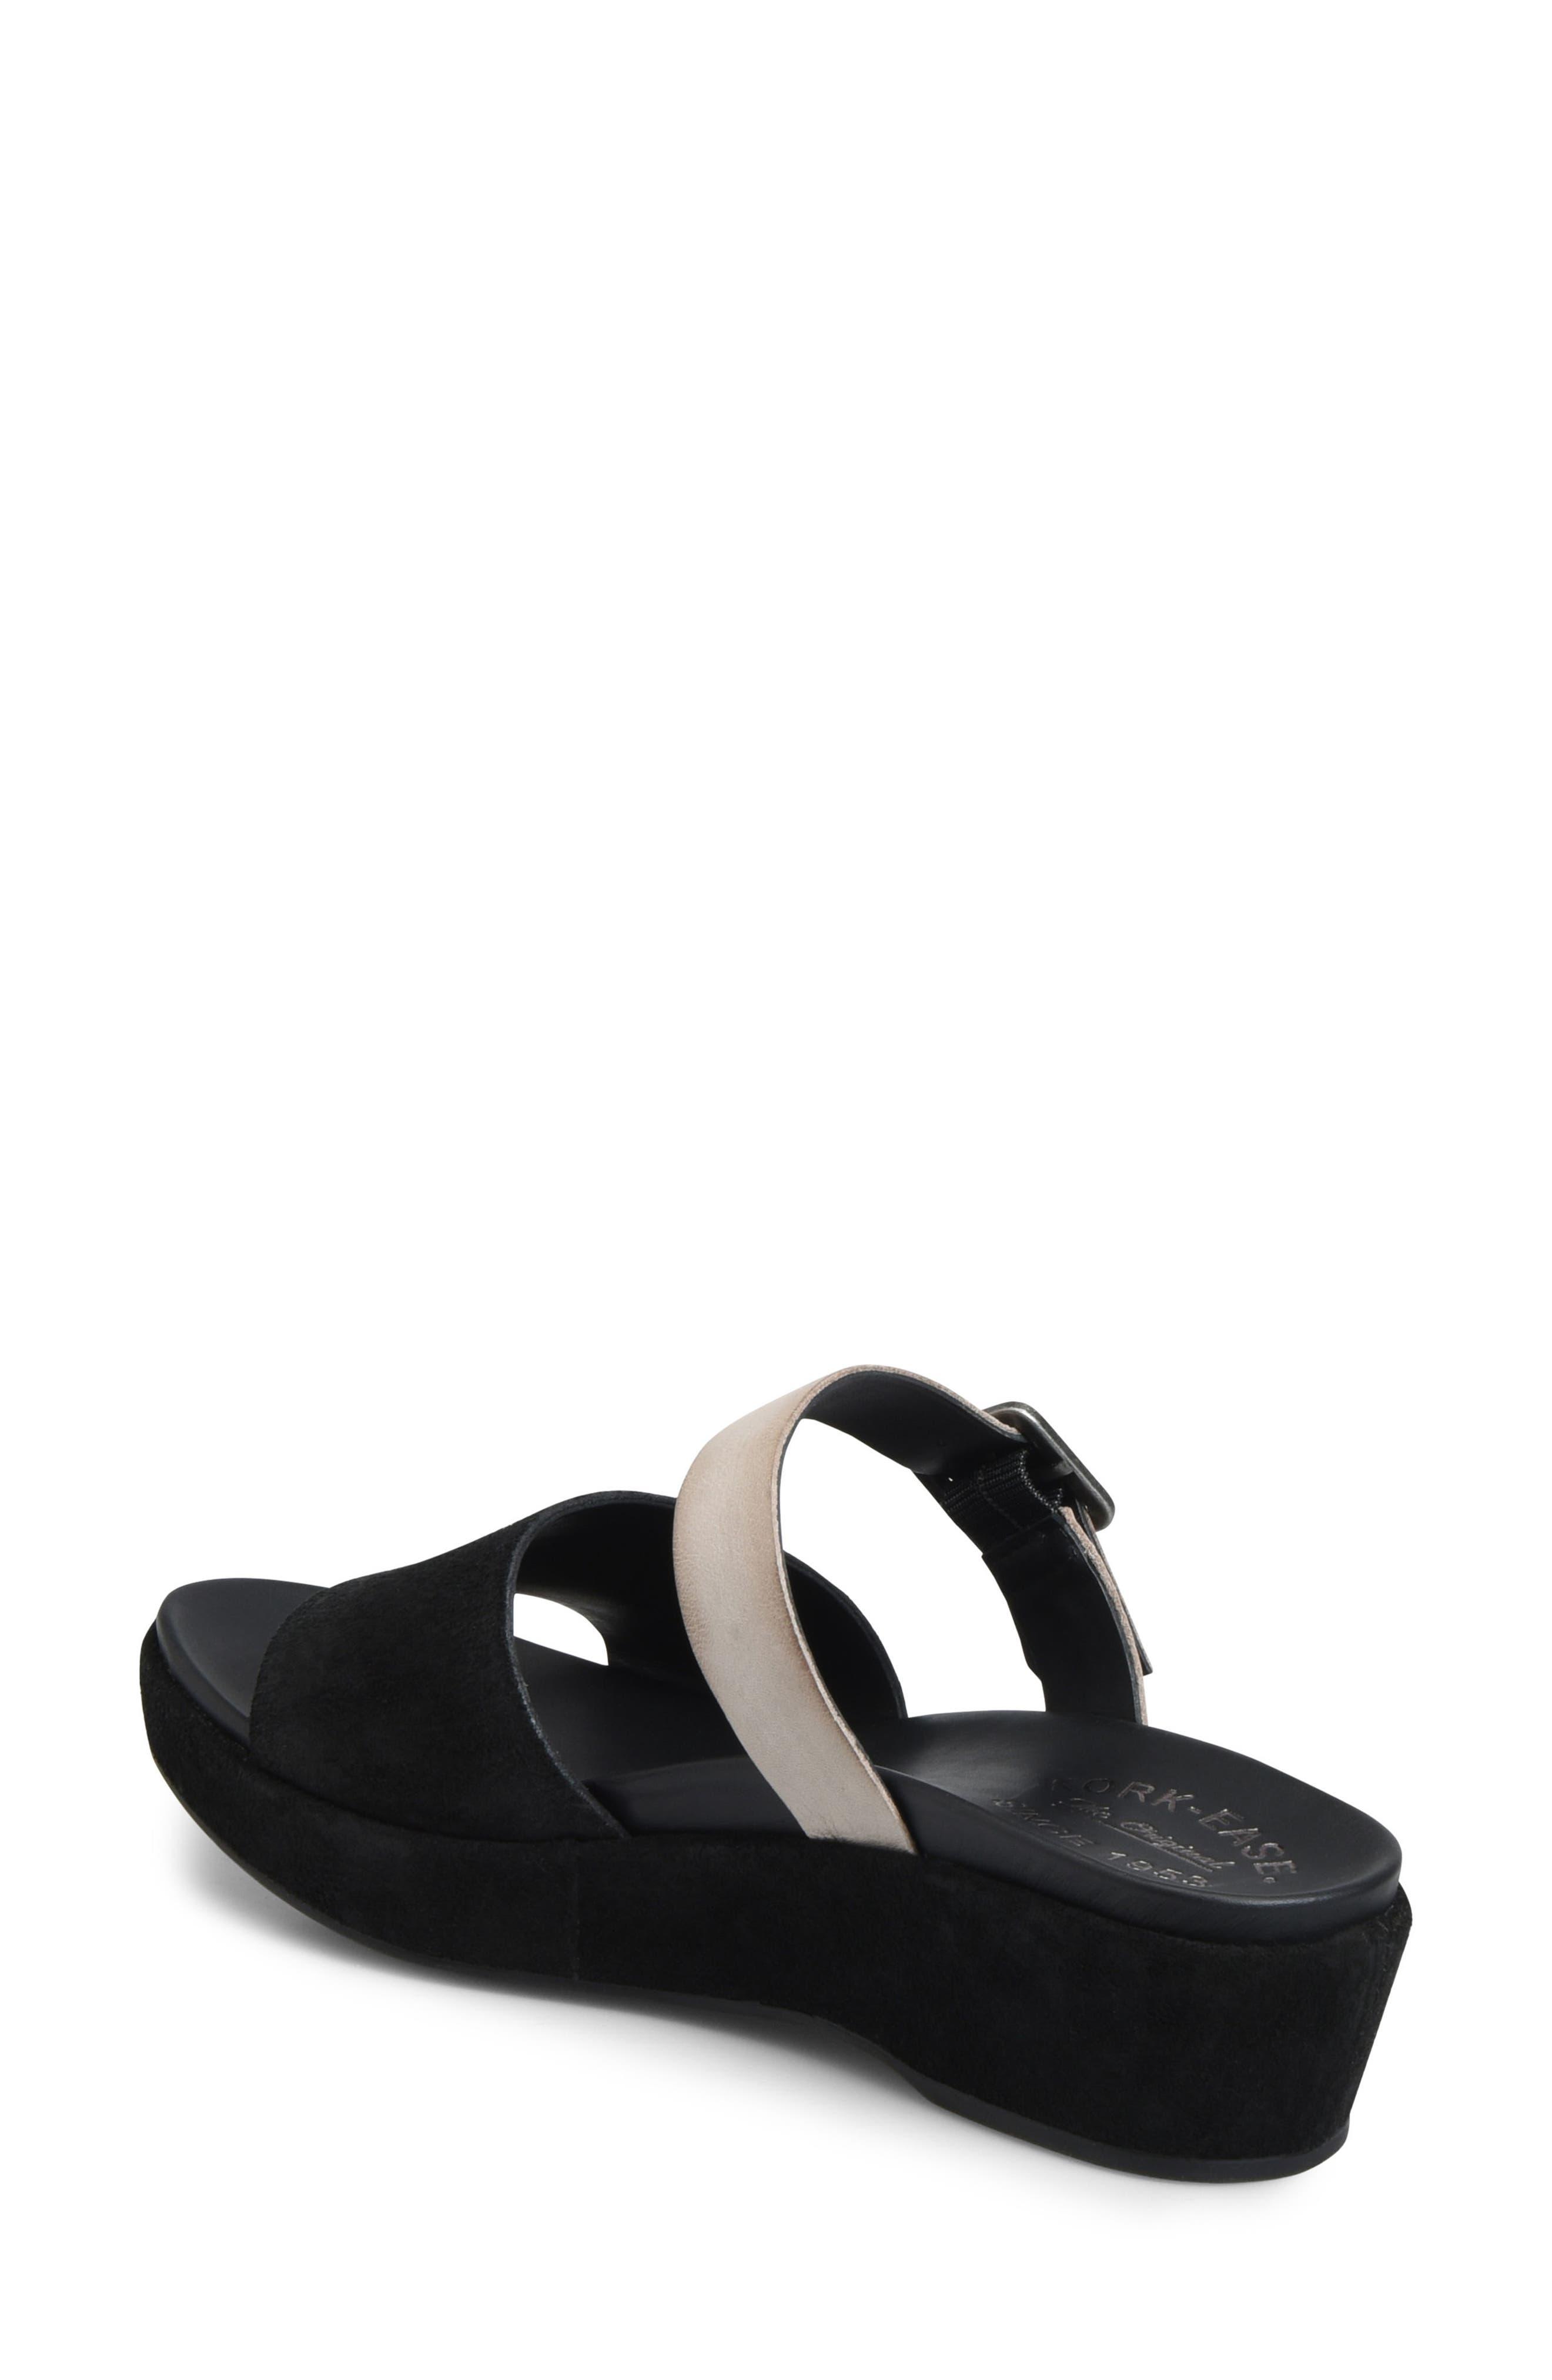 Bisti Wedge Slide Sandal,                             Alternate thumbnail 2, color,                             BLACK/ GREY LEATHER